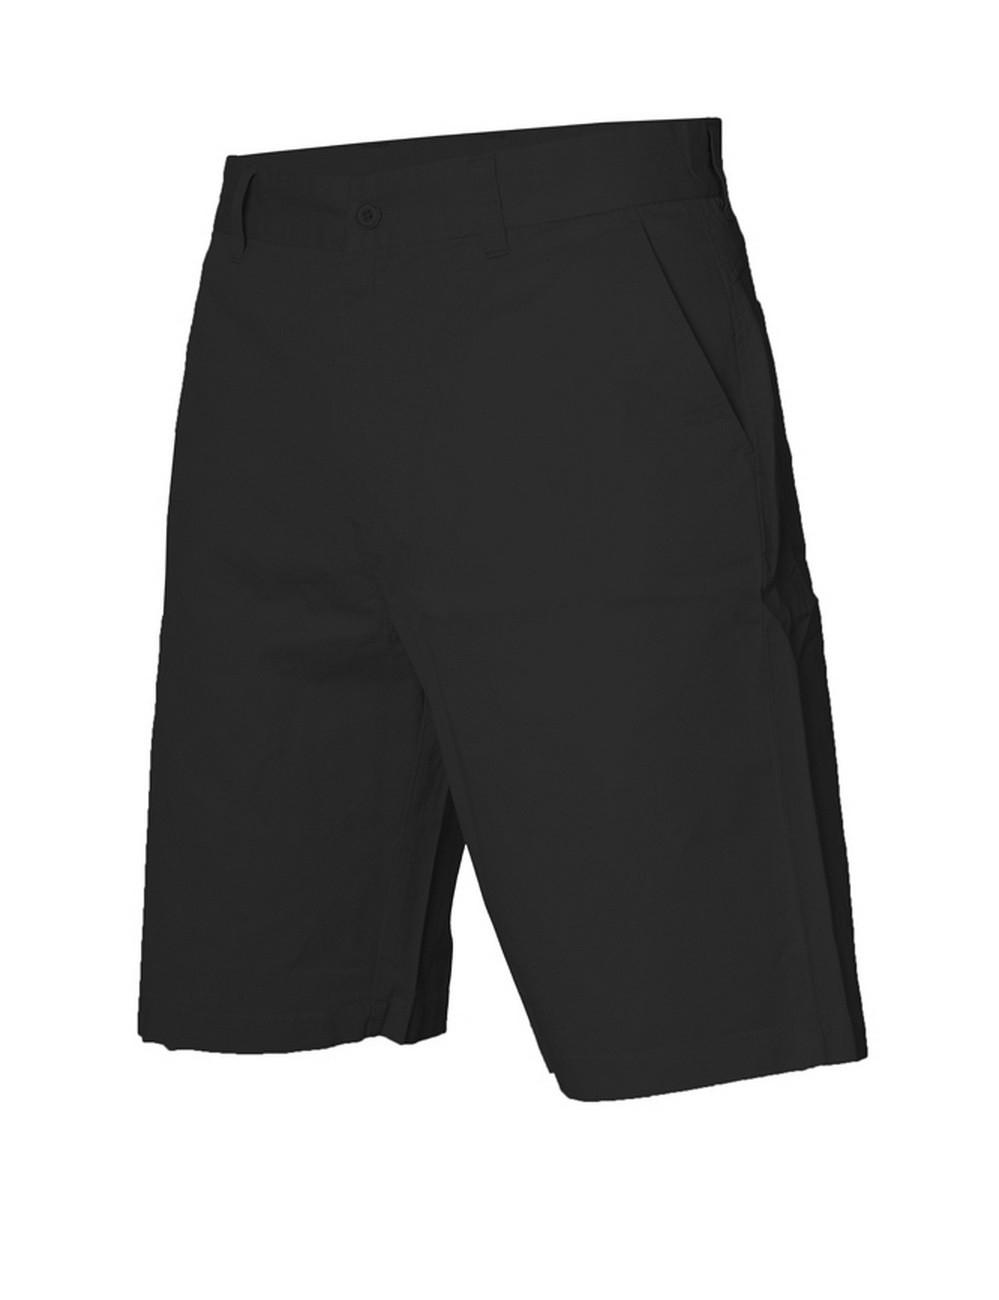 urban classics herren chino shorts kaufen jeans direct de. Black Bedroom Furniture Sets. Home Design Ideas